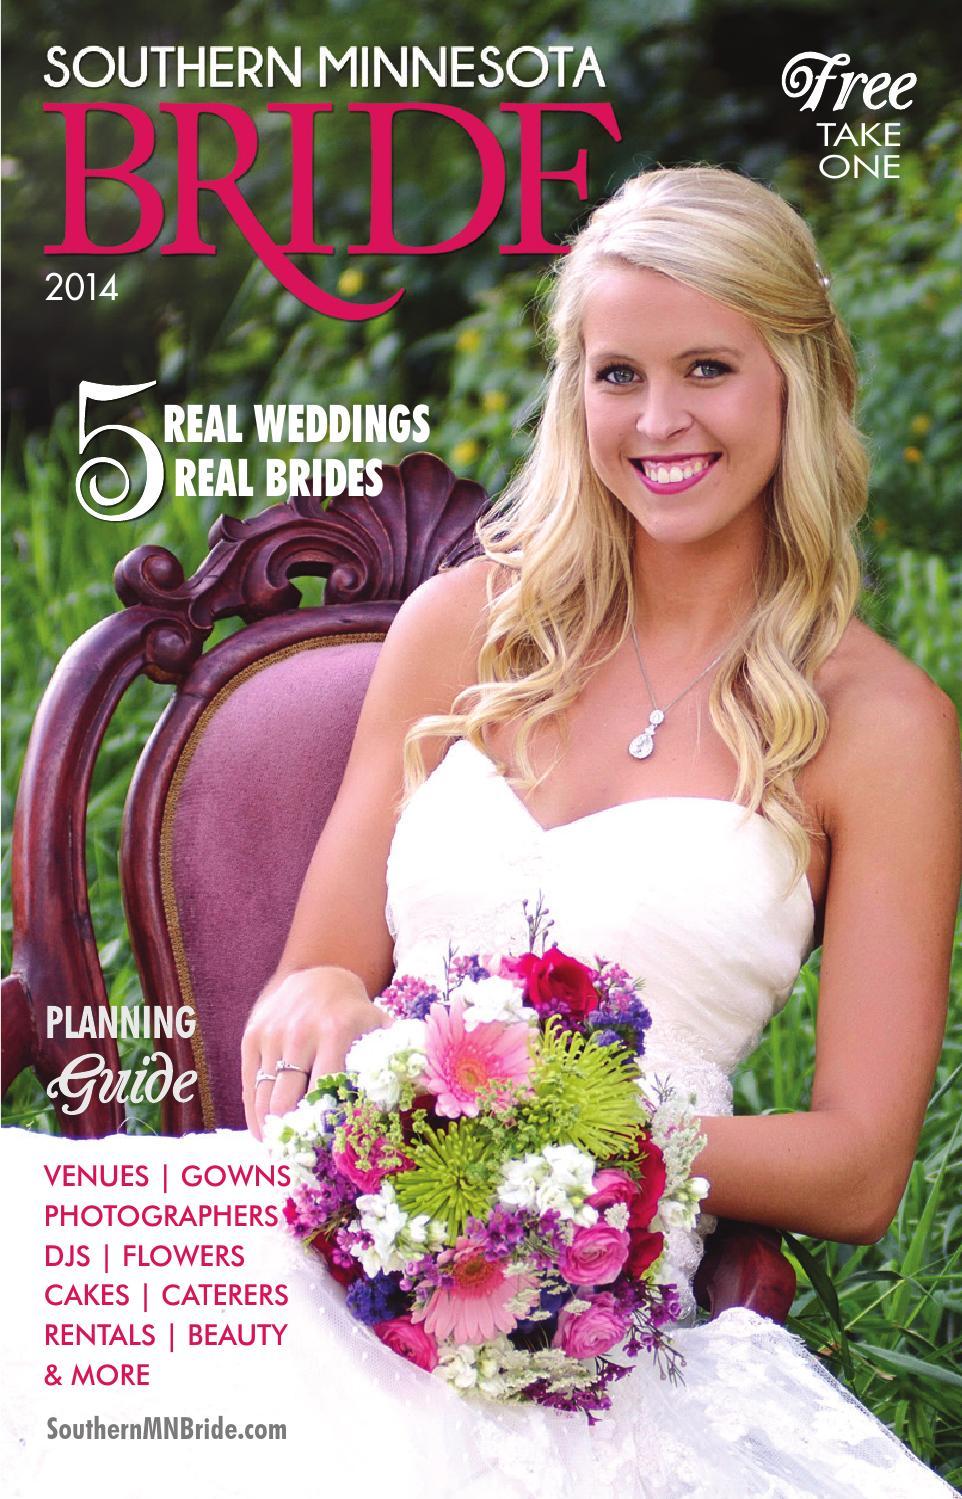 2014 Southern Minnesota Bride by Evergreen Media - issuu